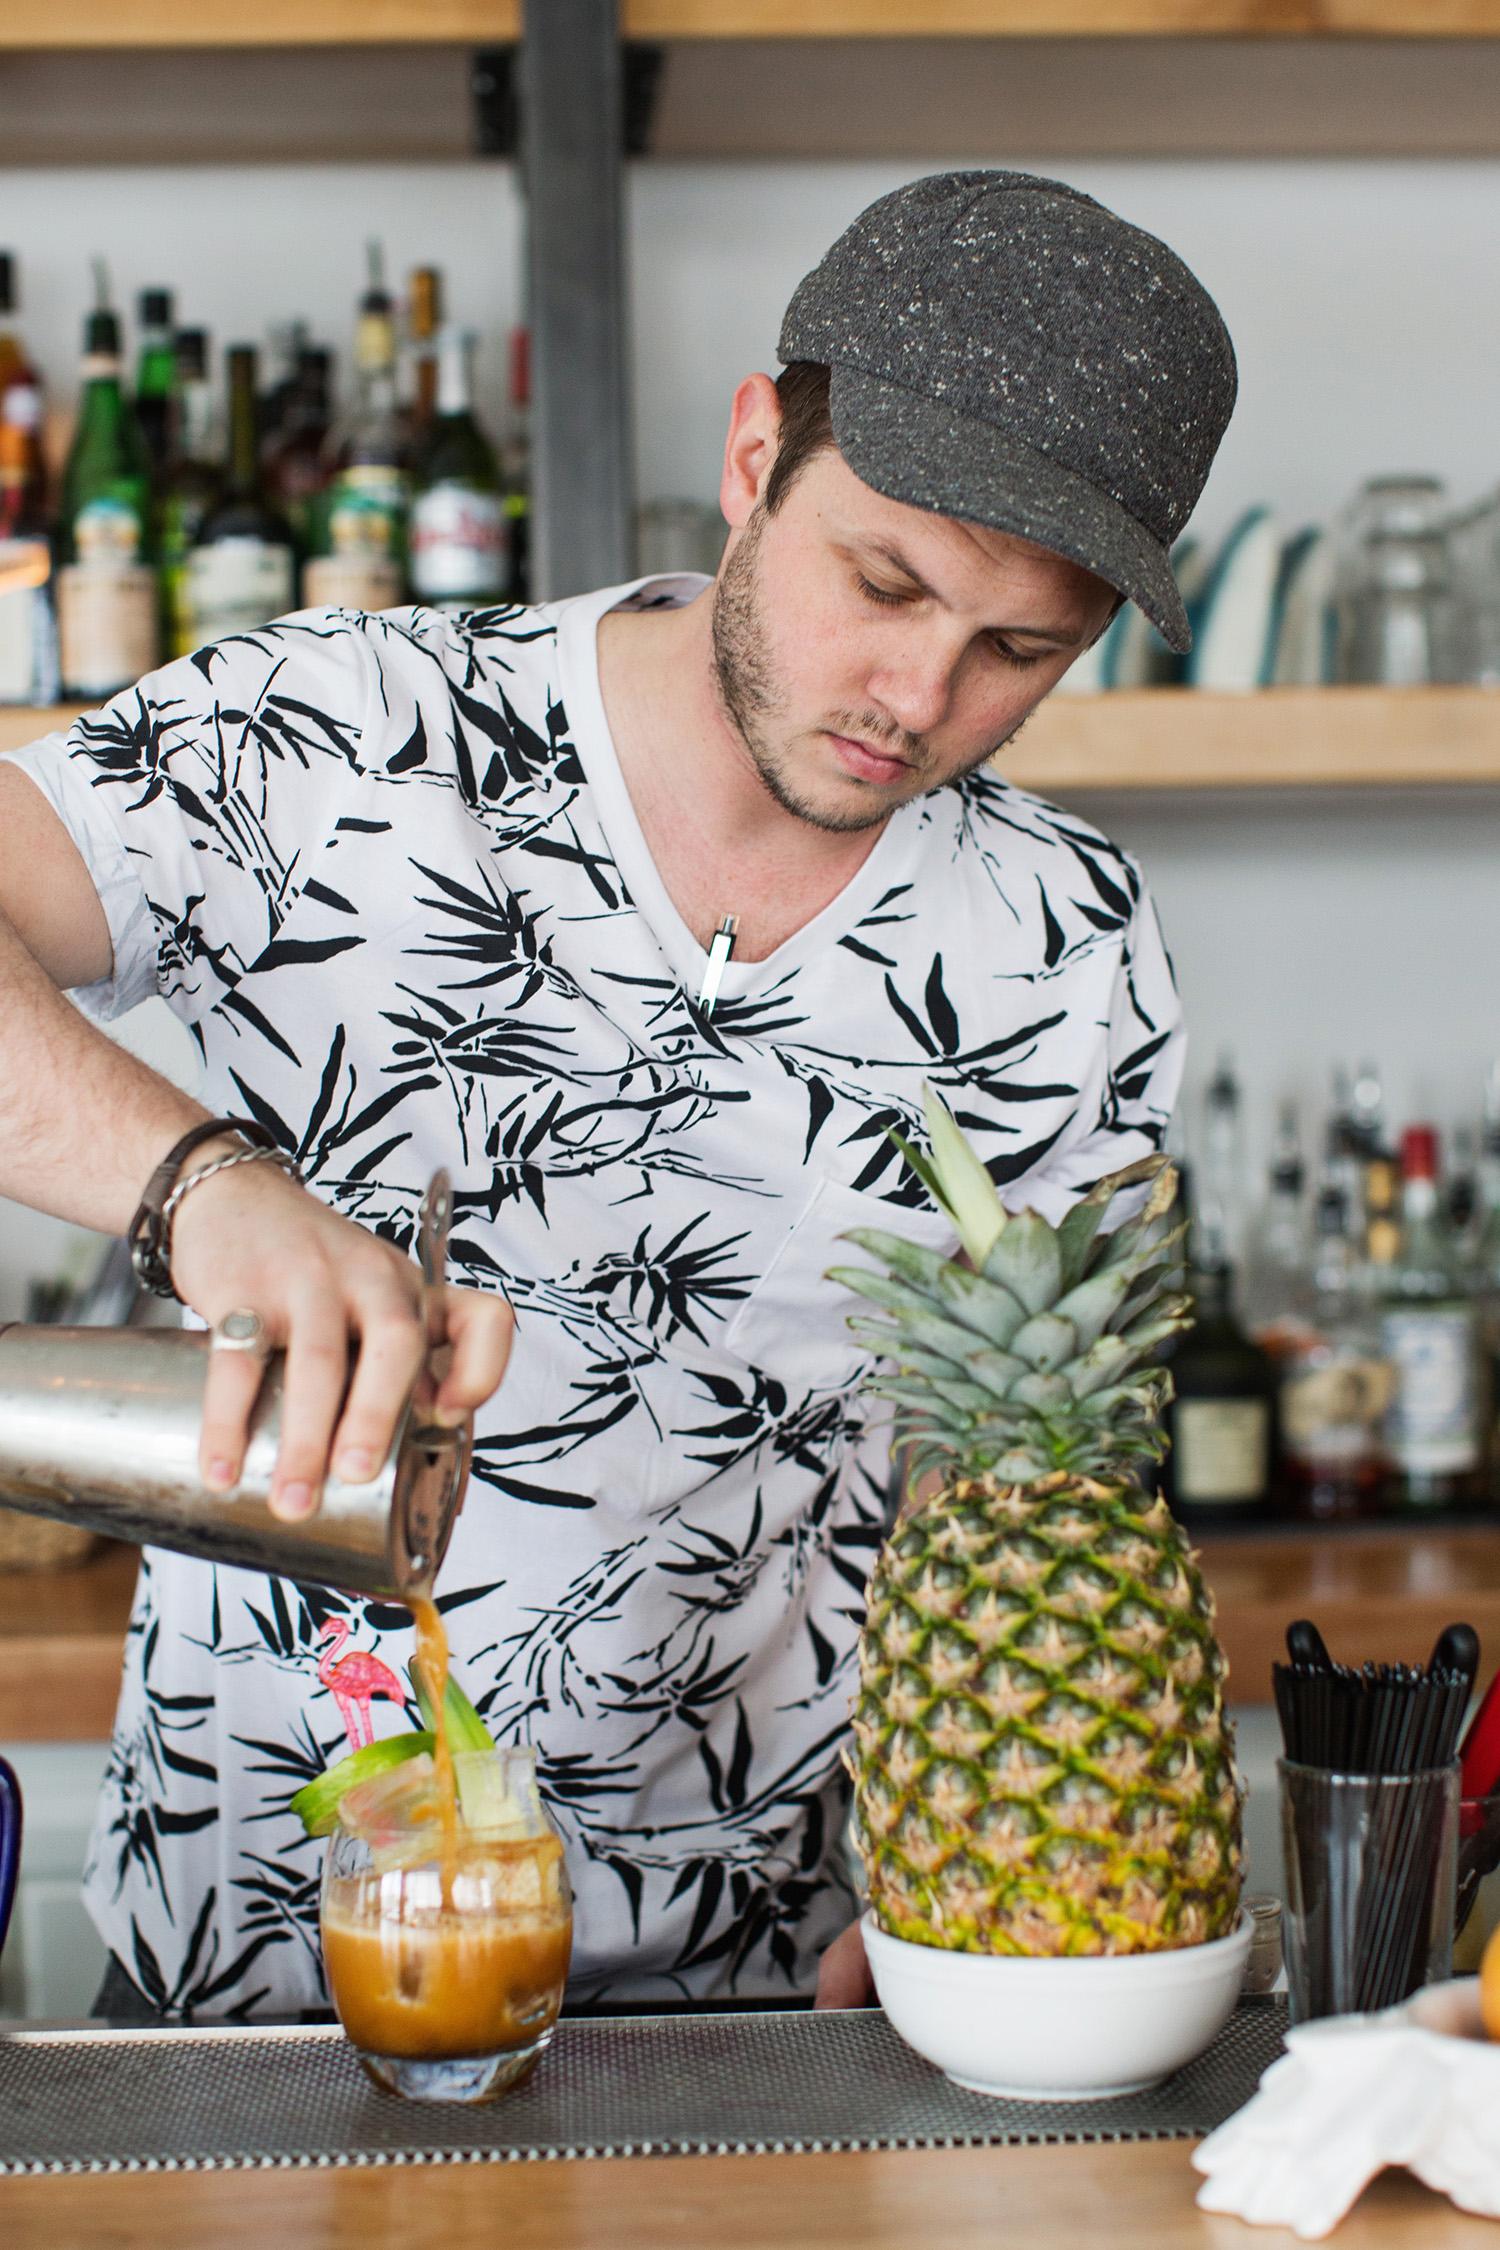 The Golden Girl Rum Club owner Josh Widner